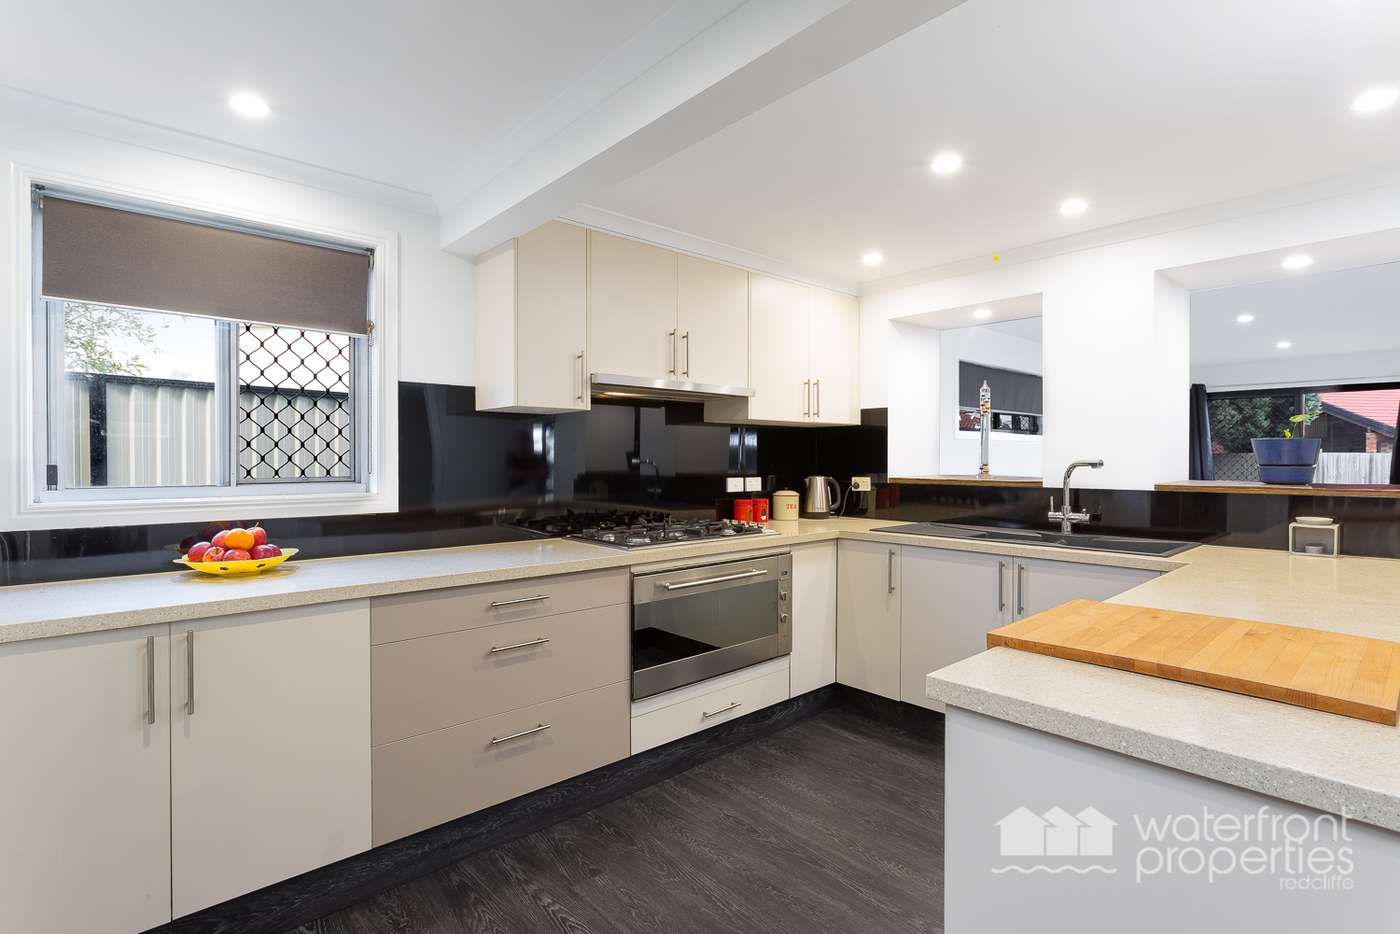 Sixth view of Homely house listing, 27 Stratford Street, Kippa-ring QLD 4021